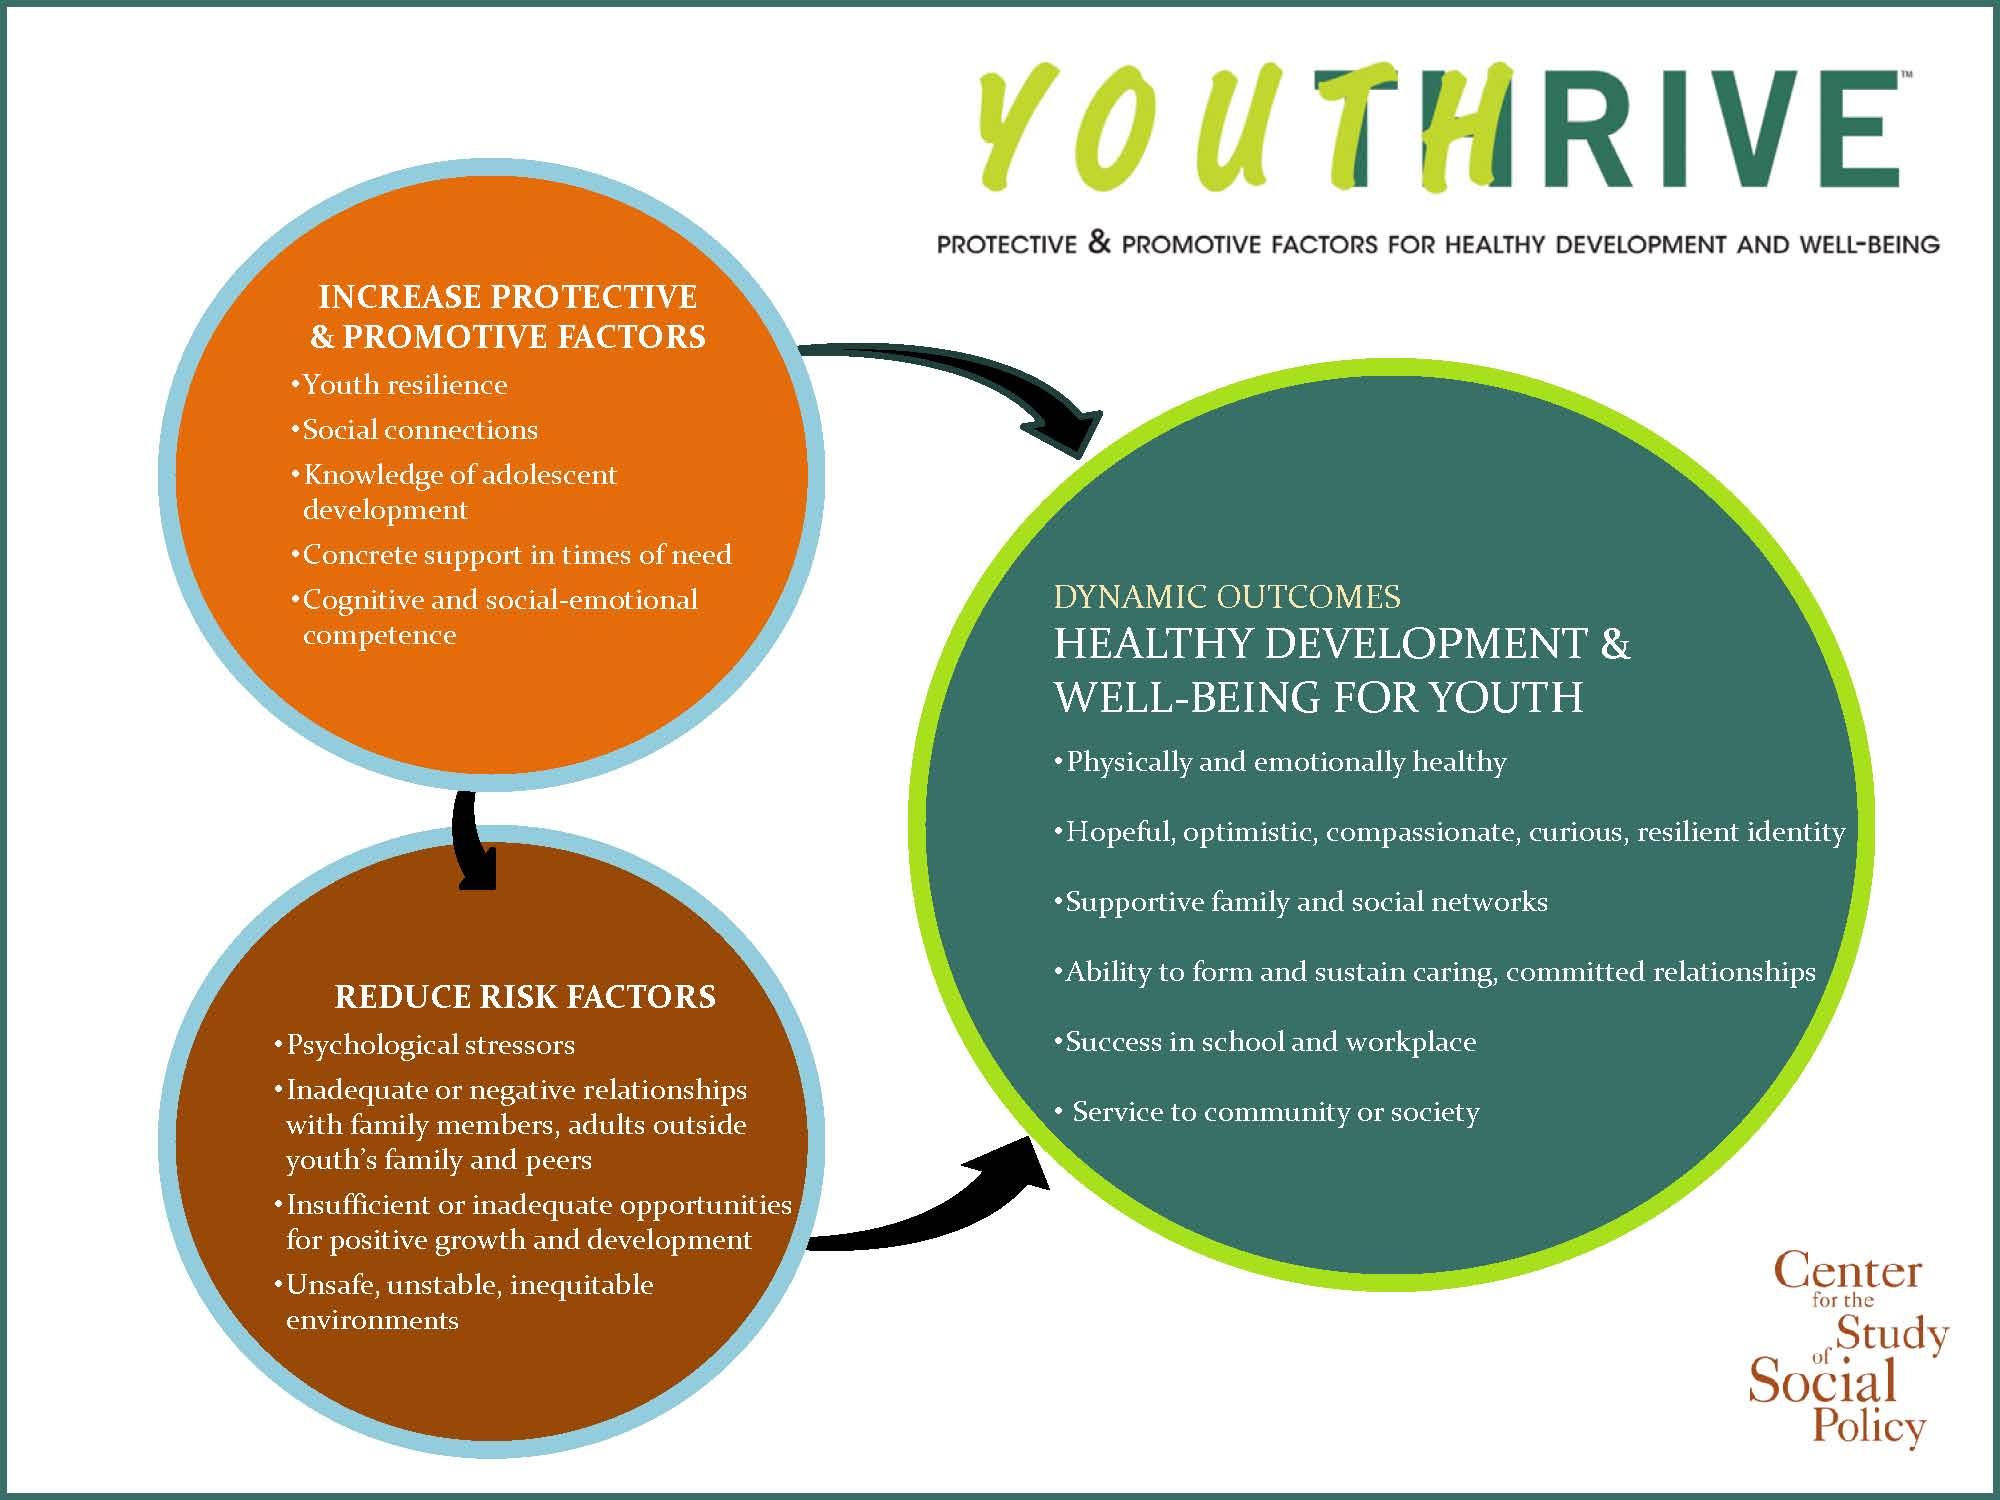 Youth-Thrive-Graphic (1).jpg